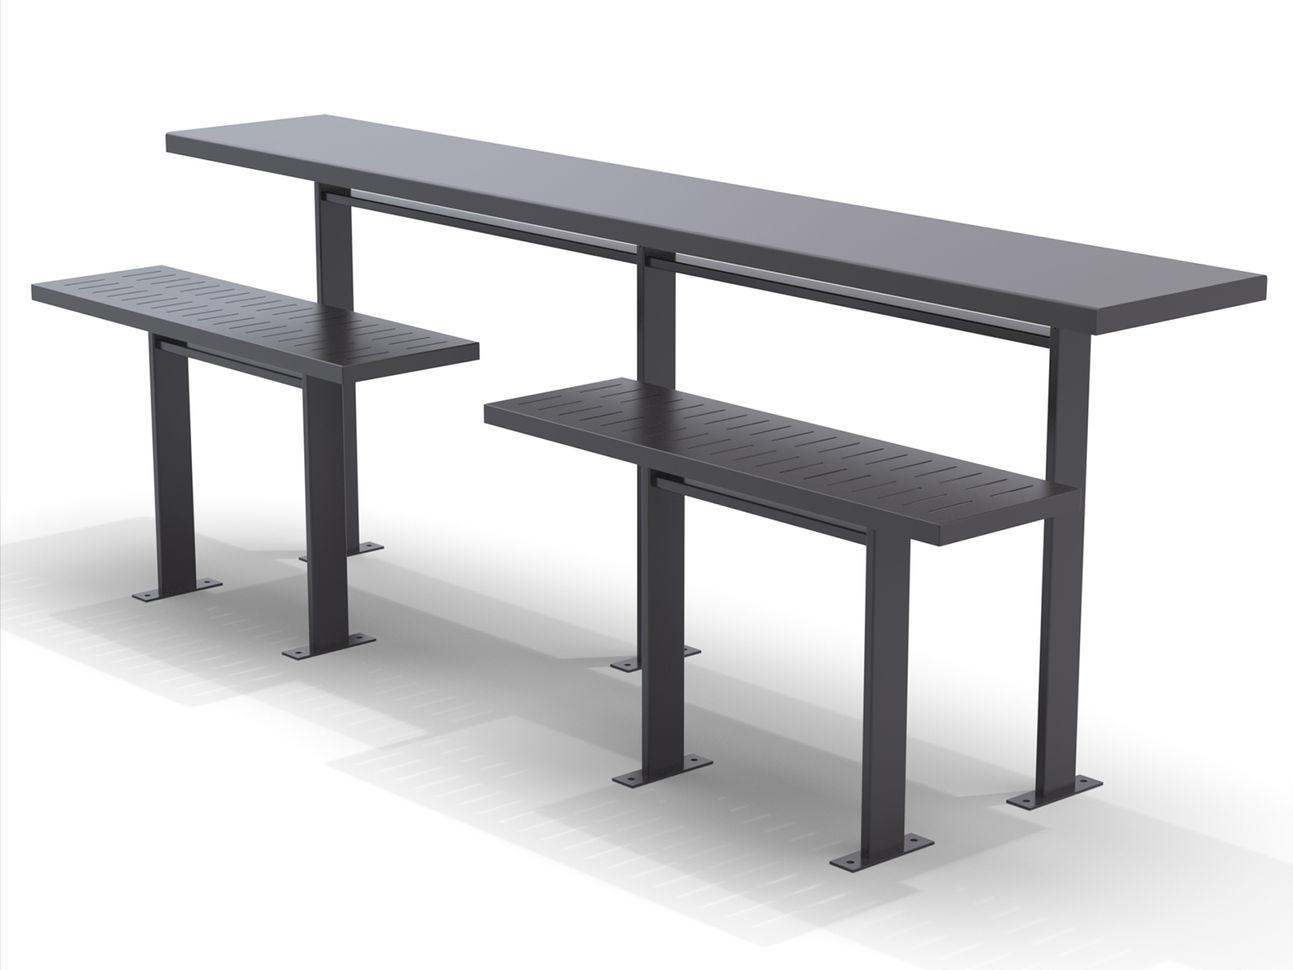 10' San Antonio Rail System with seating